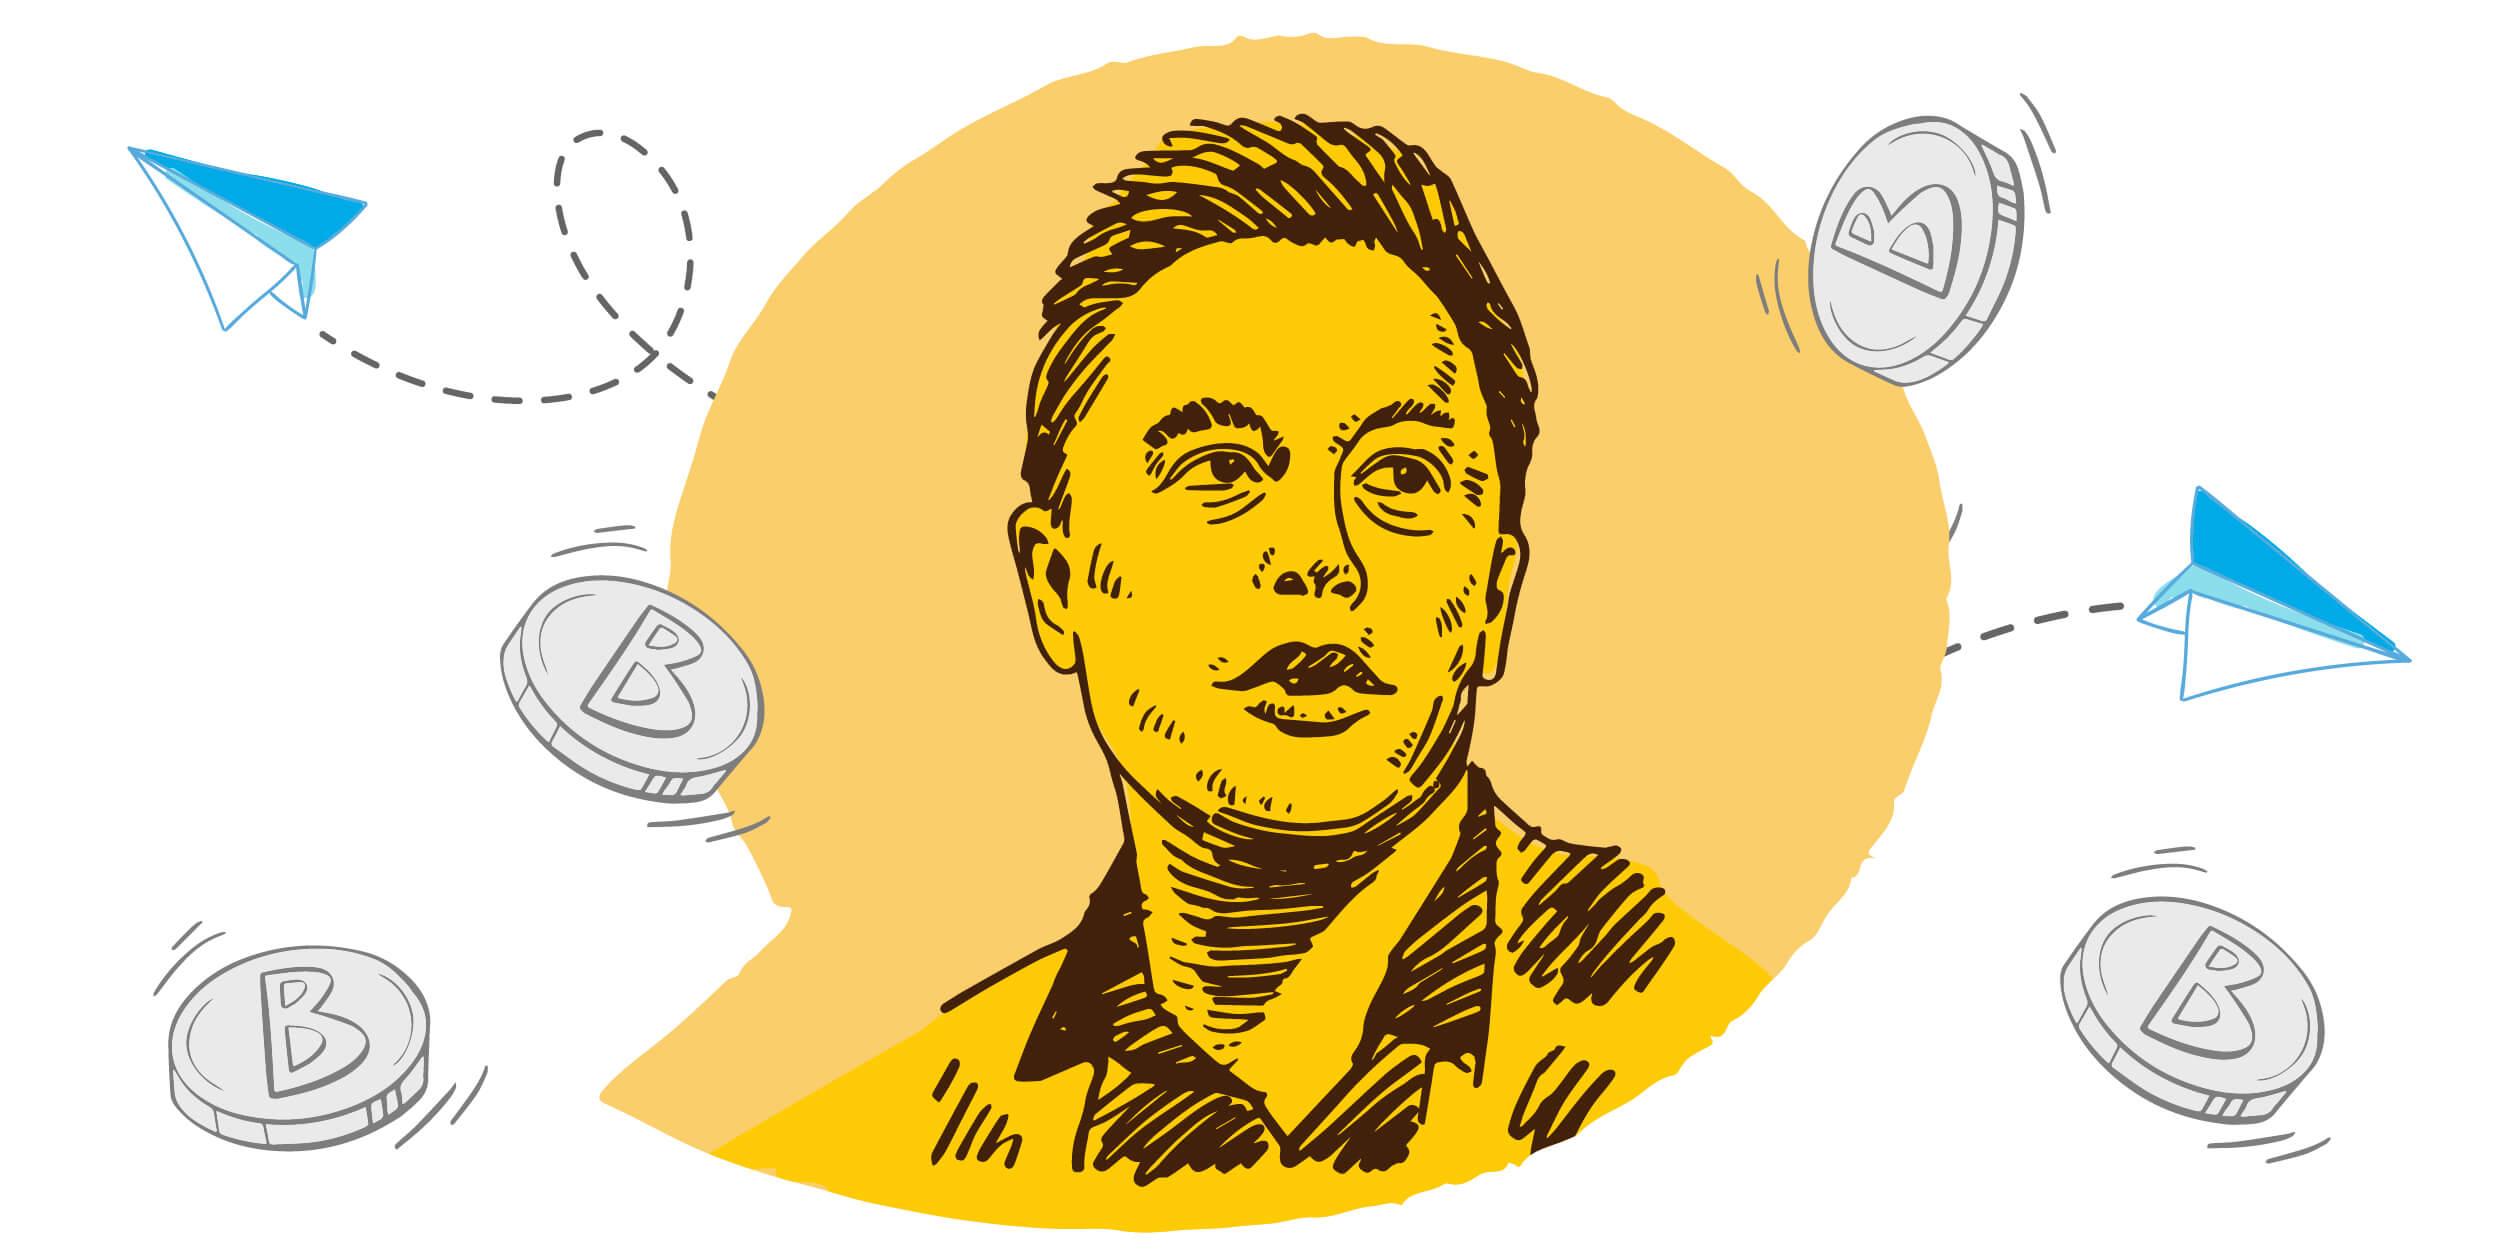 11 frases famosas memorables Bitcoin 03